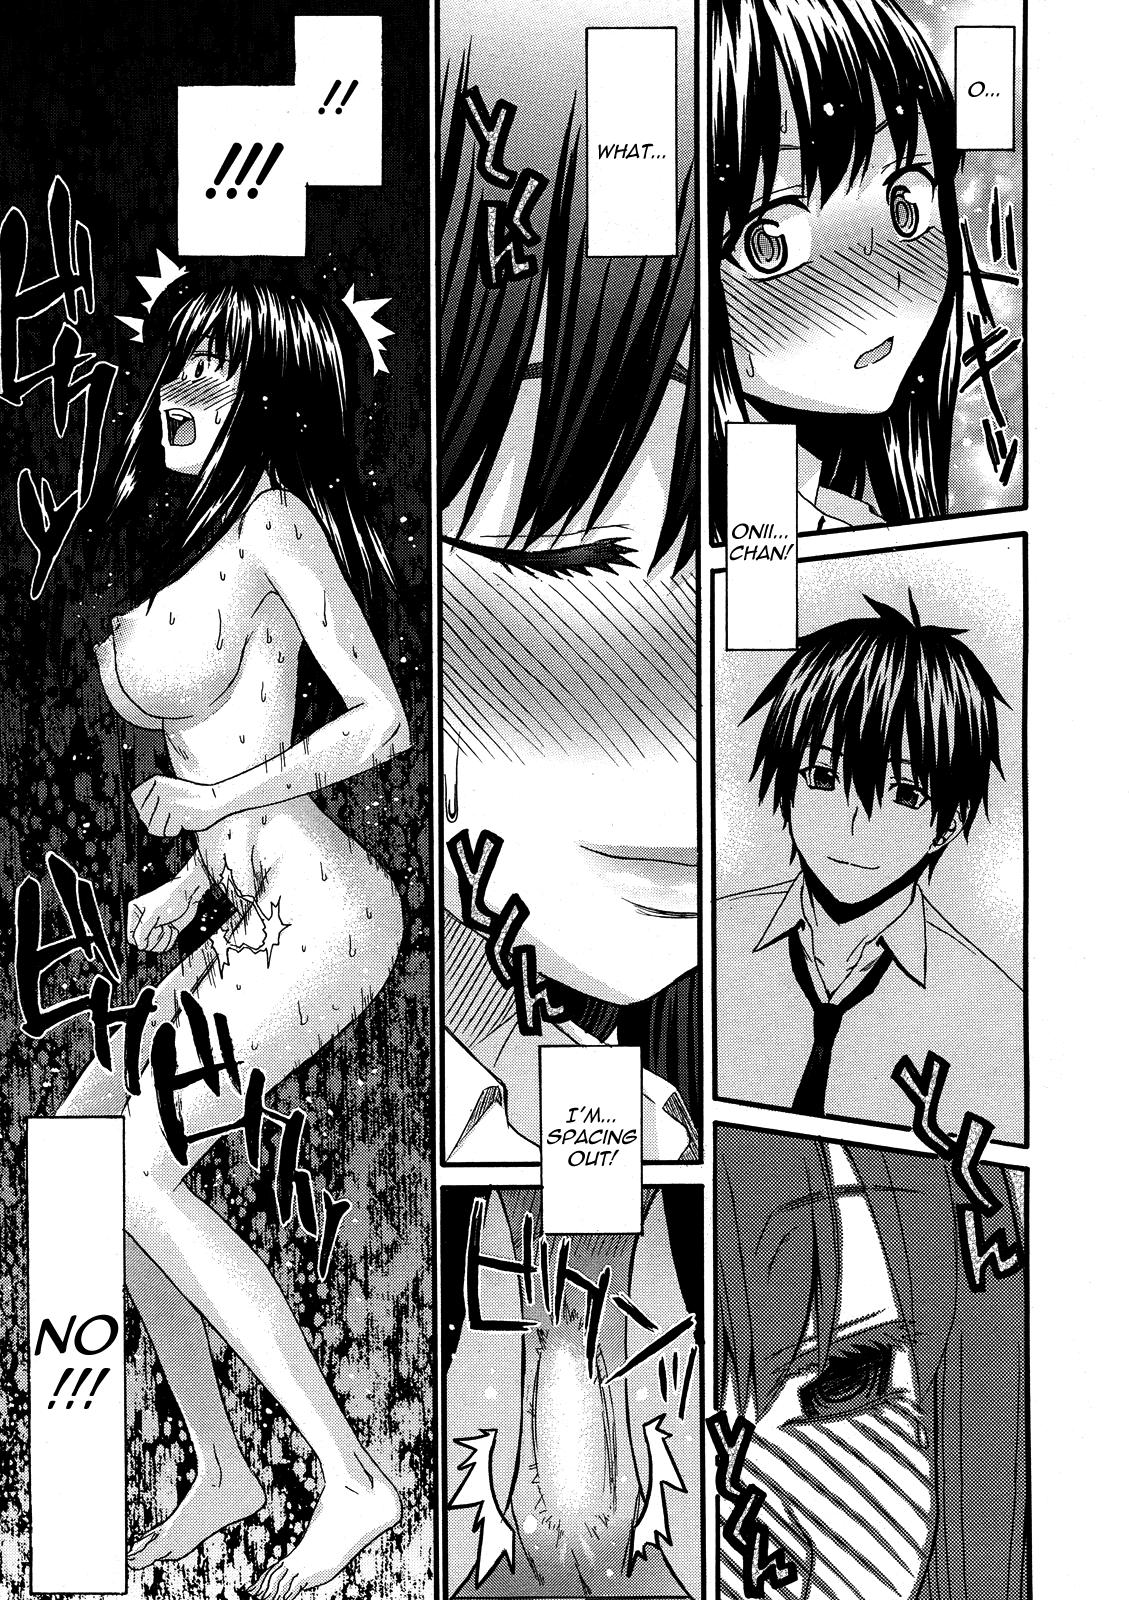 [Saegusa Kohaku] Onii-chan to Watashi | Onii-chan & I (COMIC Megastore 2011-12) [ENG] [Yoroshii] 4